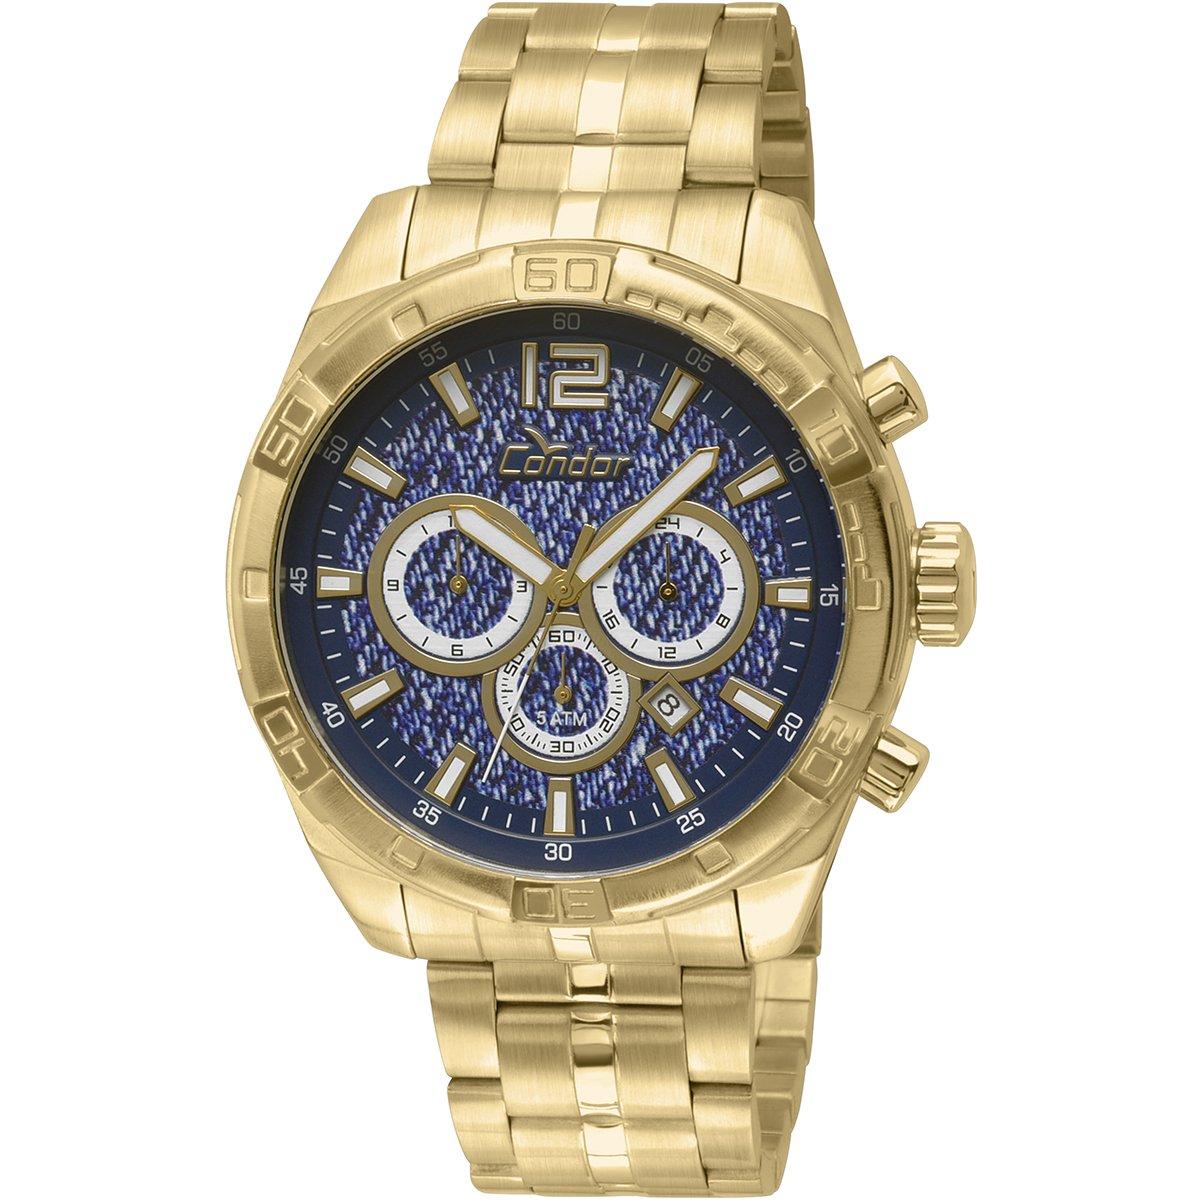 3d693f04fd2 Relógio Condor Analógico COVD33AI4A - Compre Agora